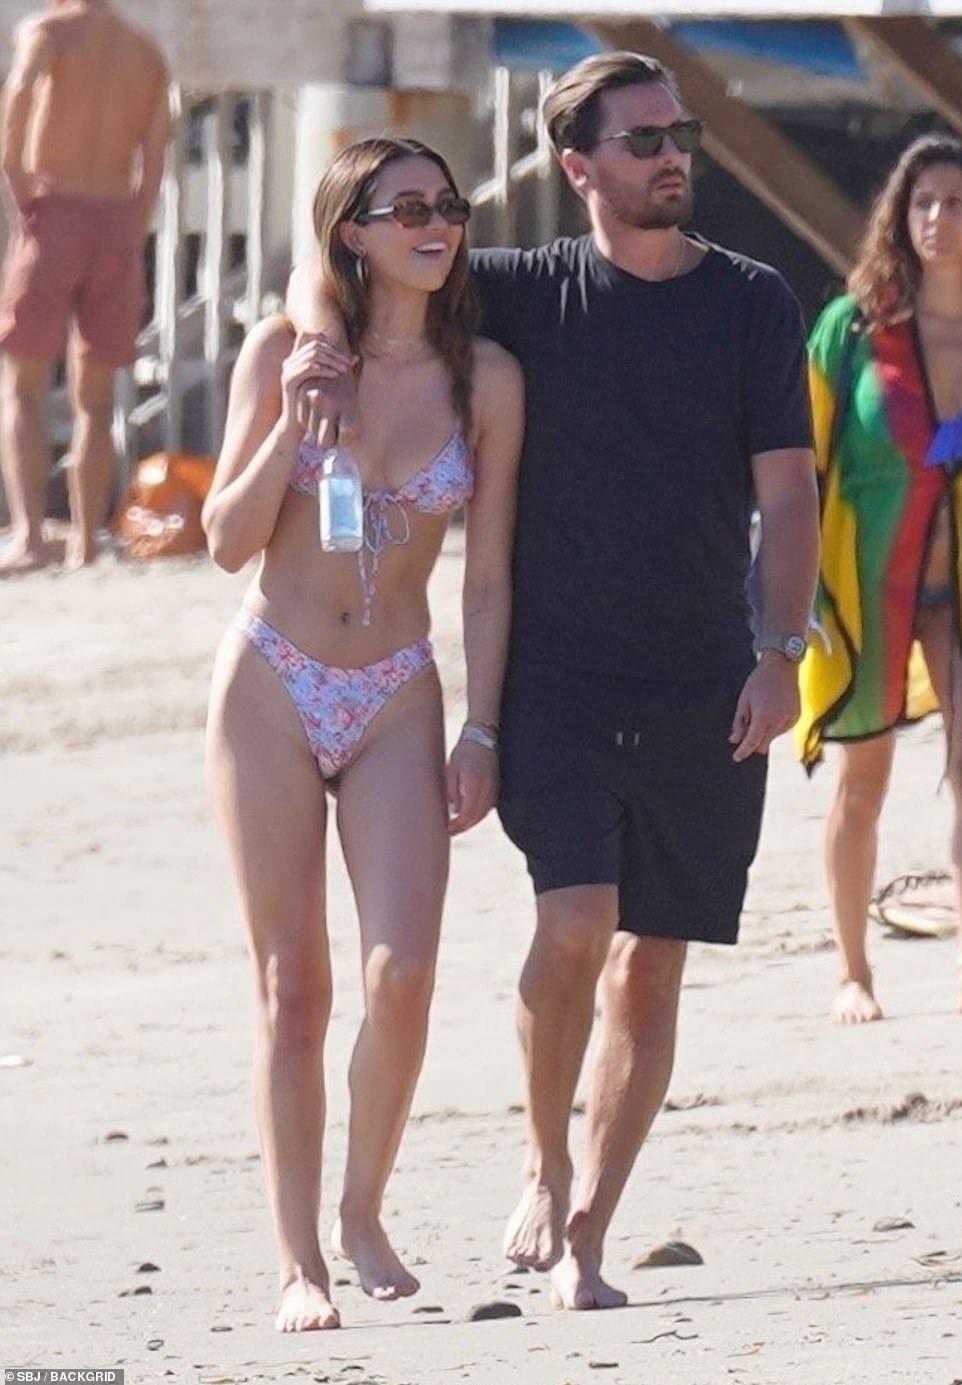 Scott Disick, 37, hits the beach with 19-year-old Amelia Hamlin